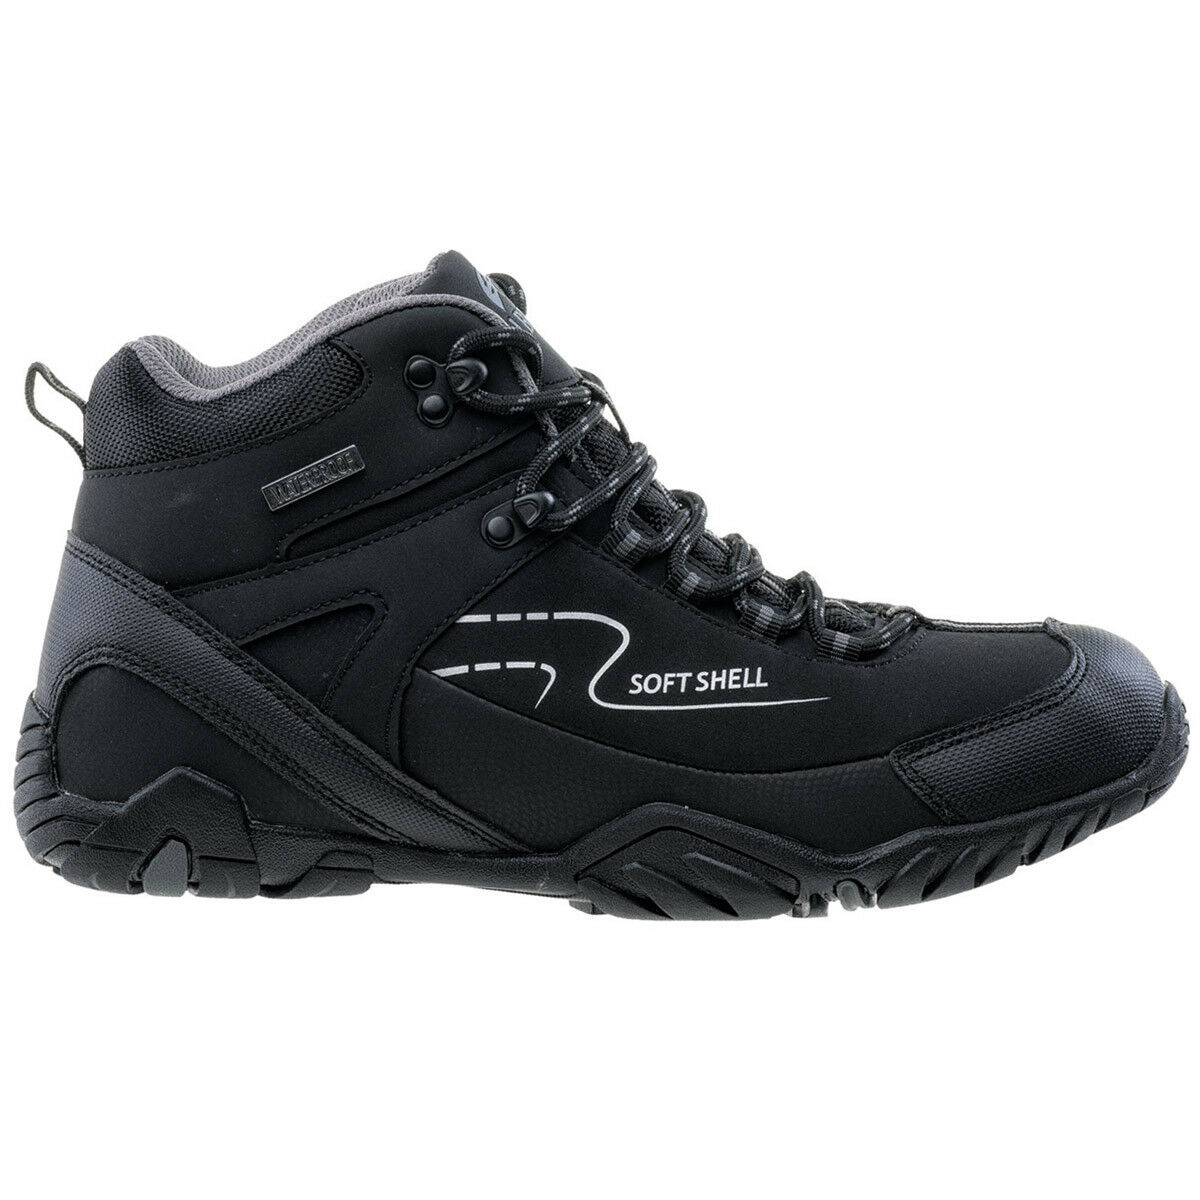 Elbrus Baash Mid WP Softshell Herren Schuhe Schuhe Schuhe Wanderschuhe Trekking Outdoor NEU 109619